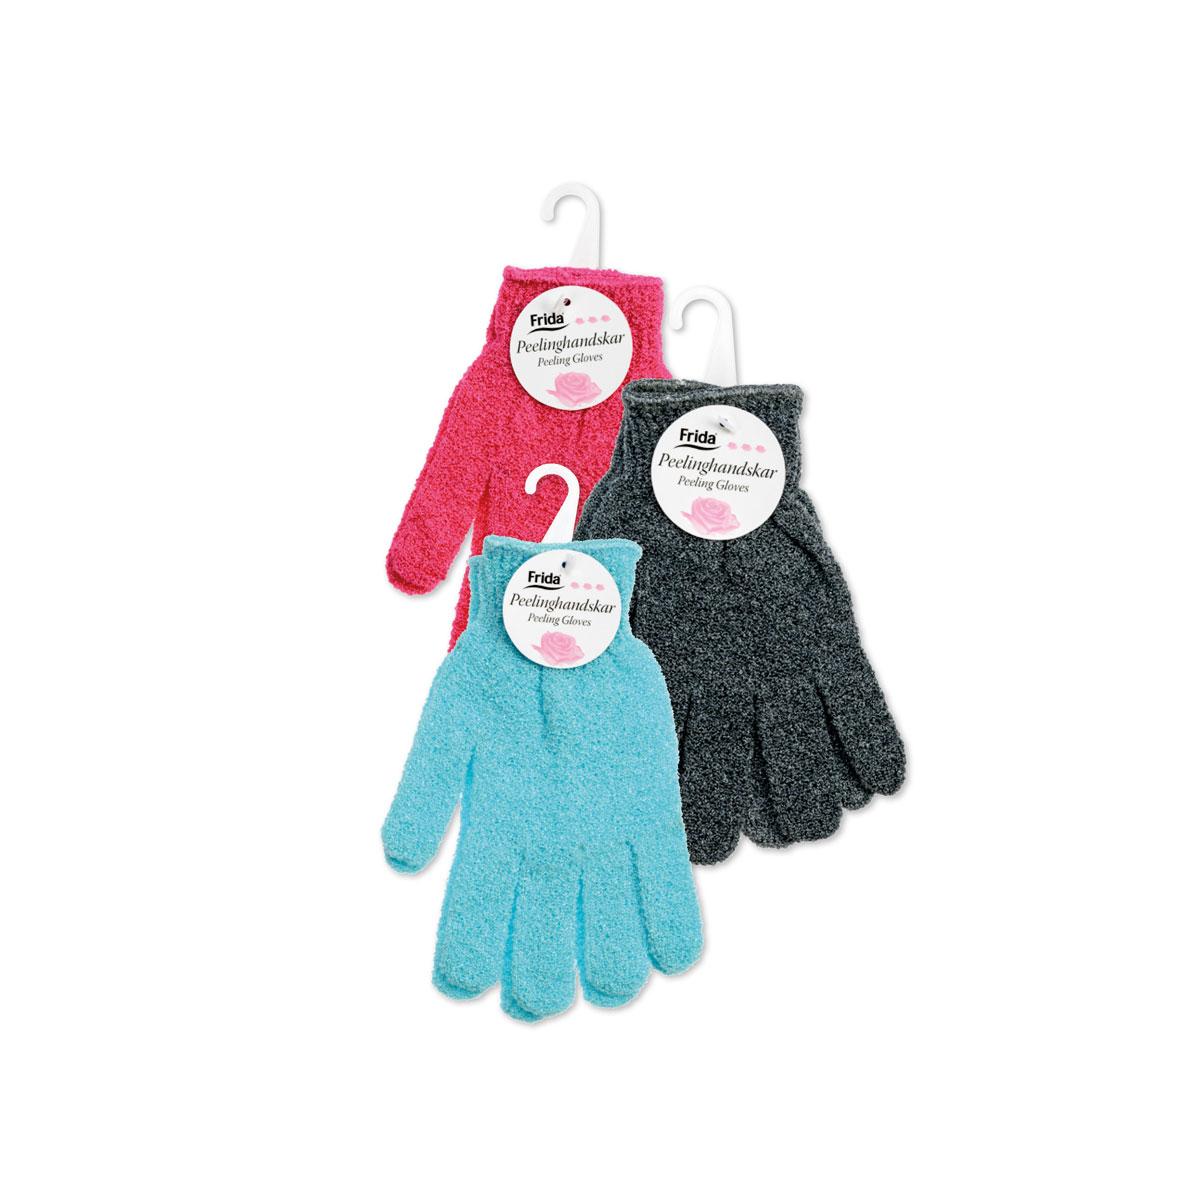 Peeling gloves